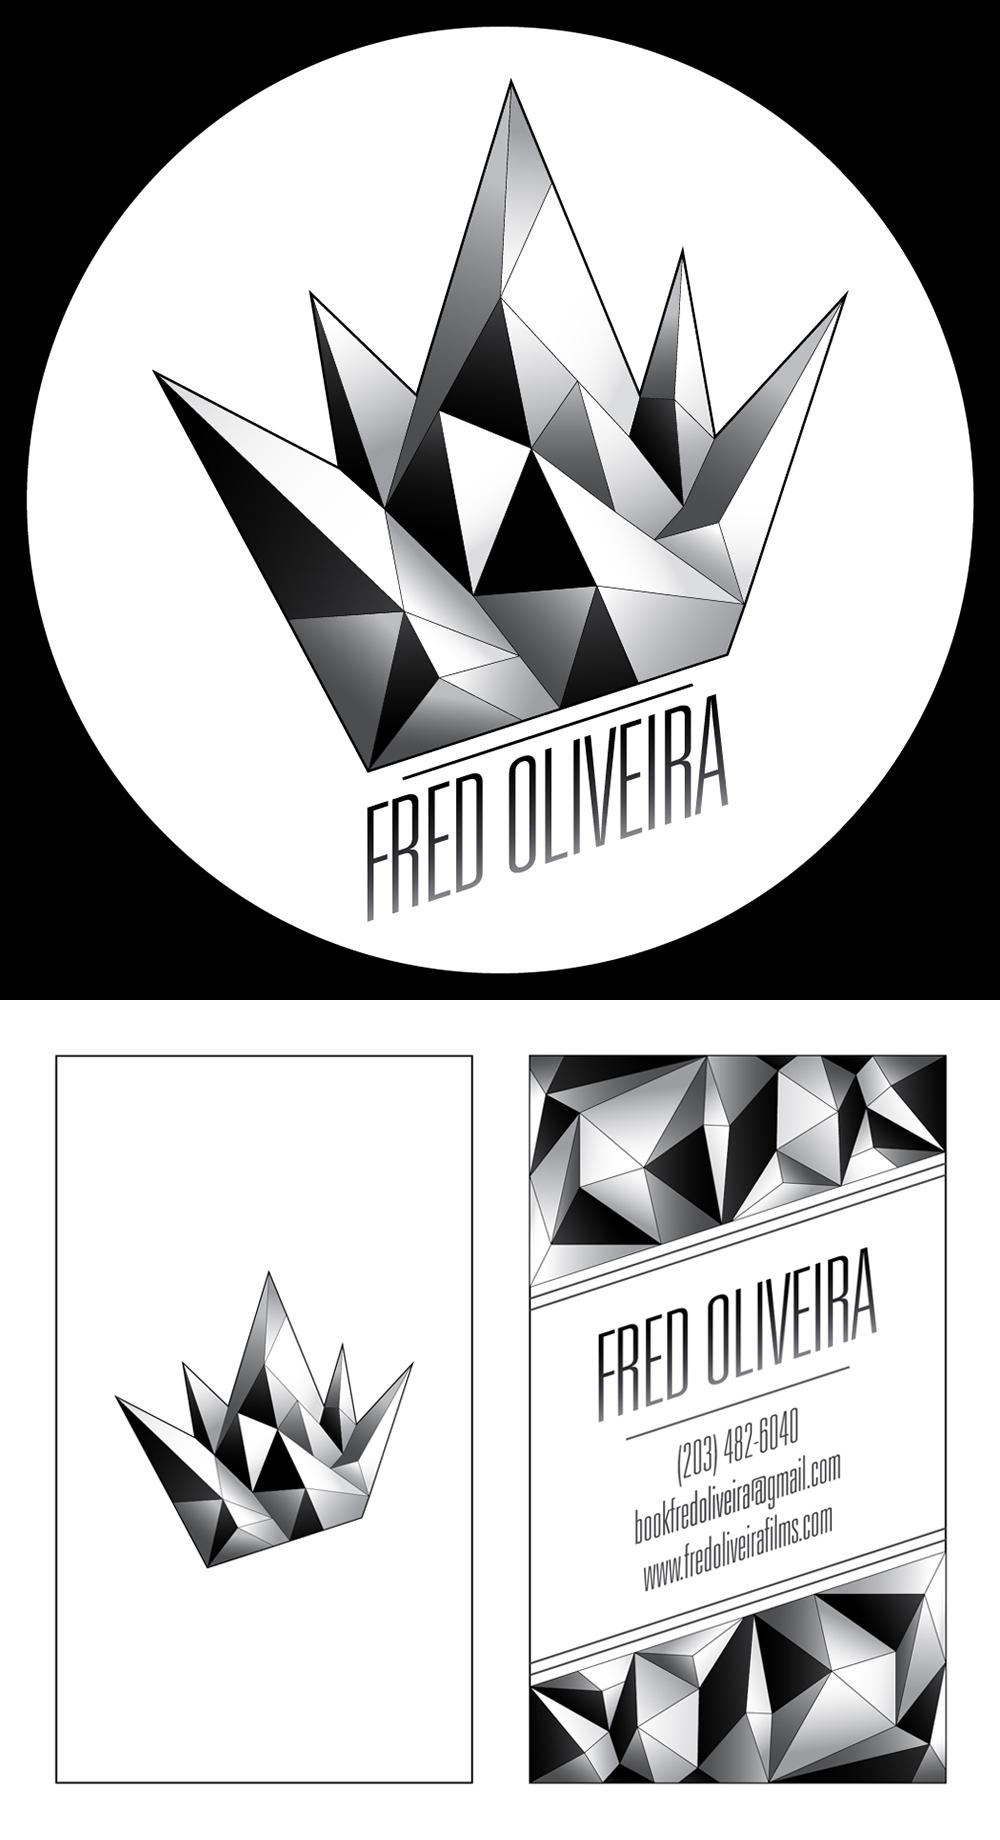 FRED OLIVEIRA_LOGO_CARDS.jpg